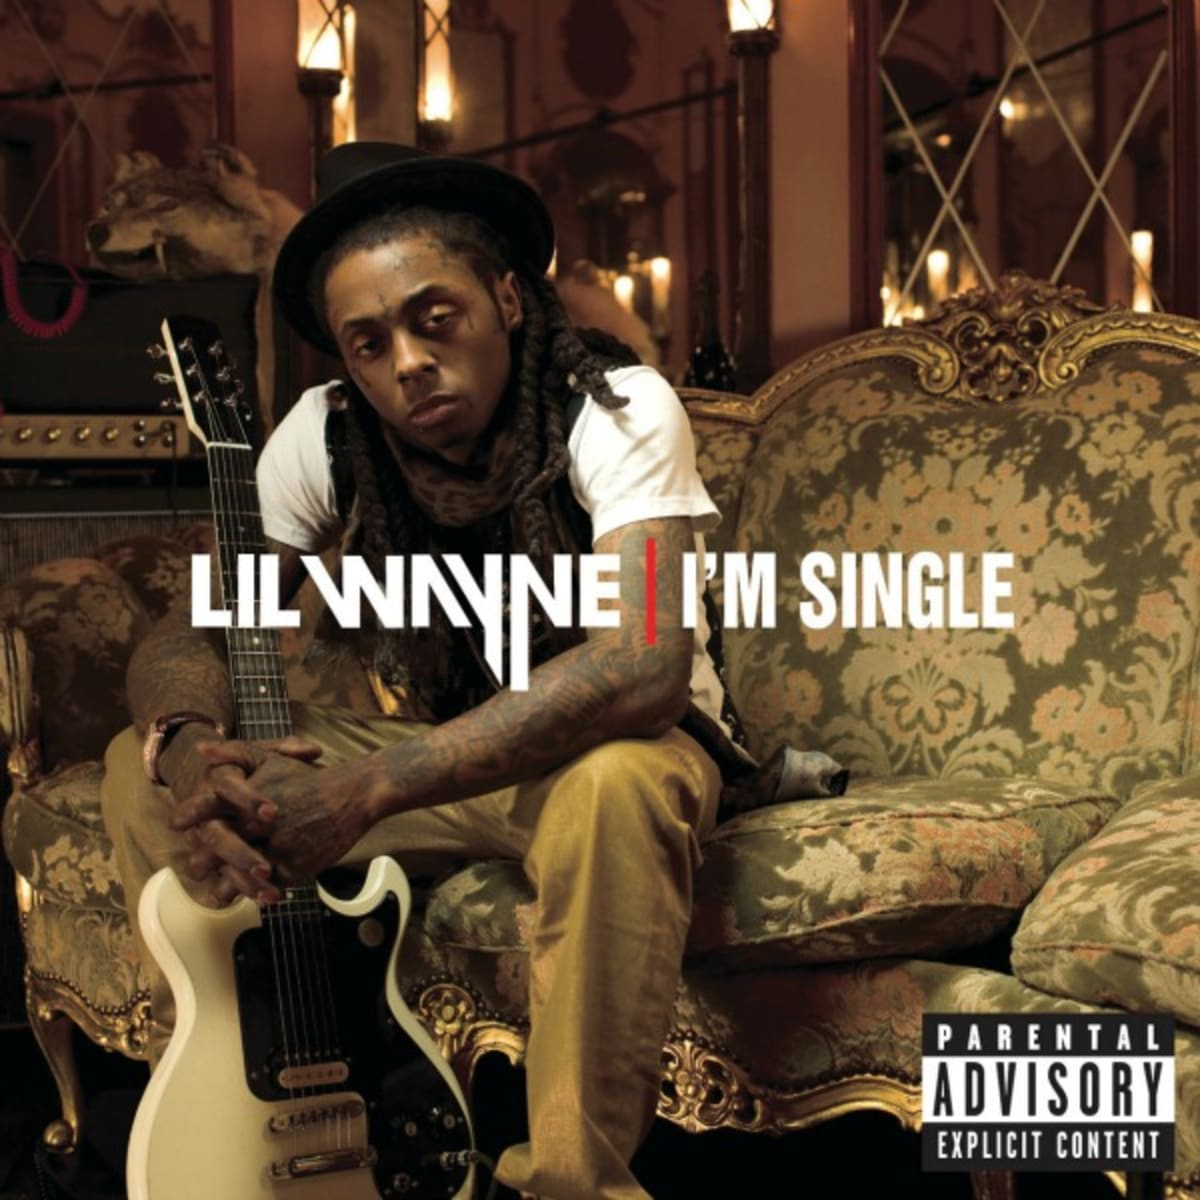 wayne singles